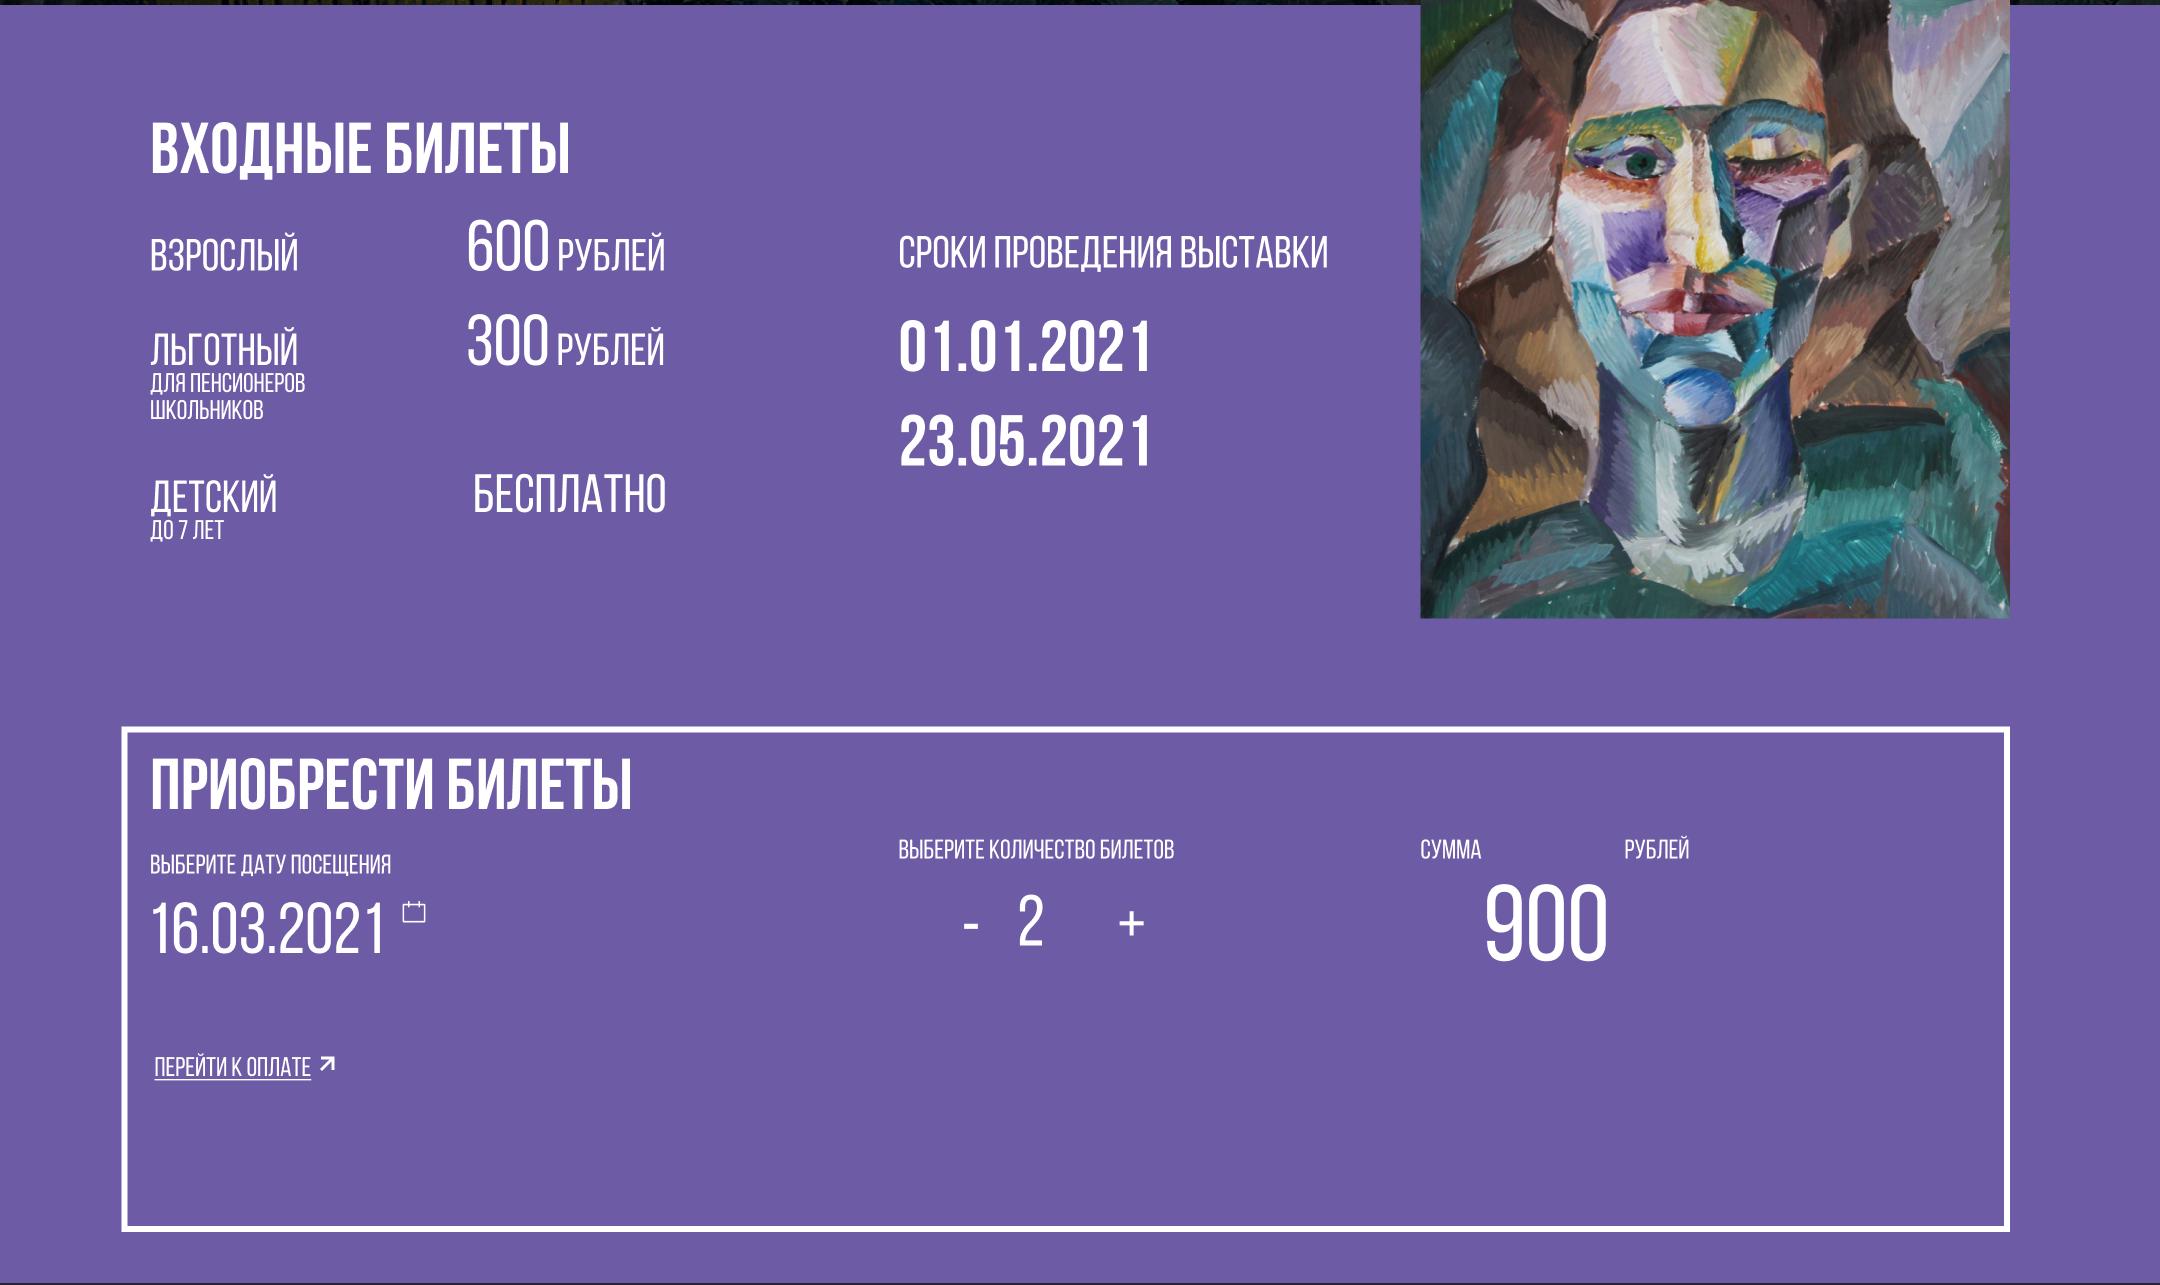 8001415713